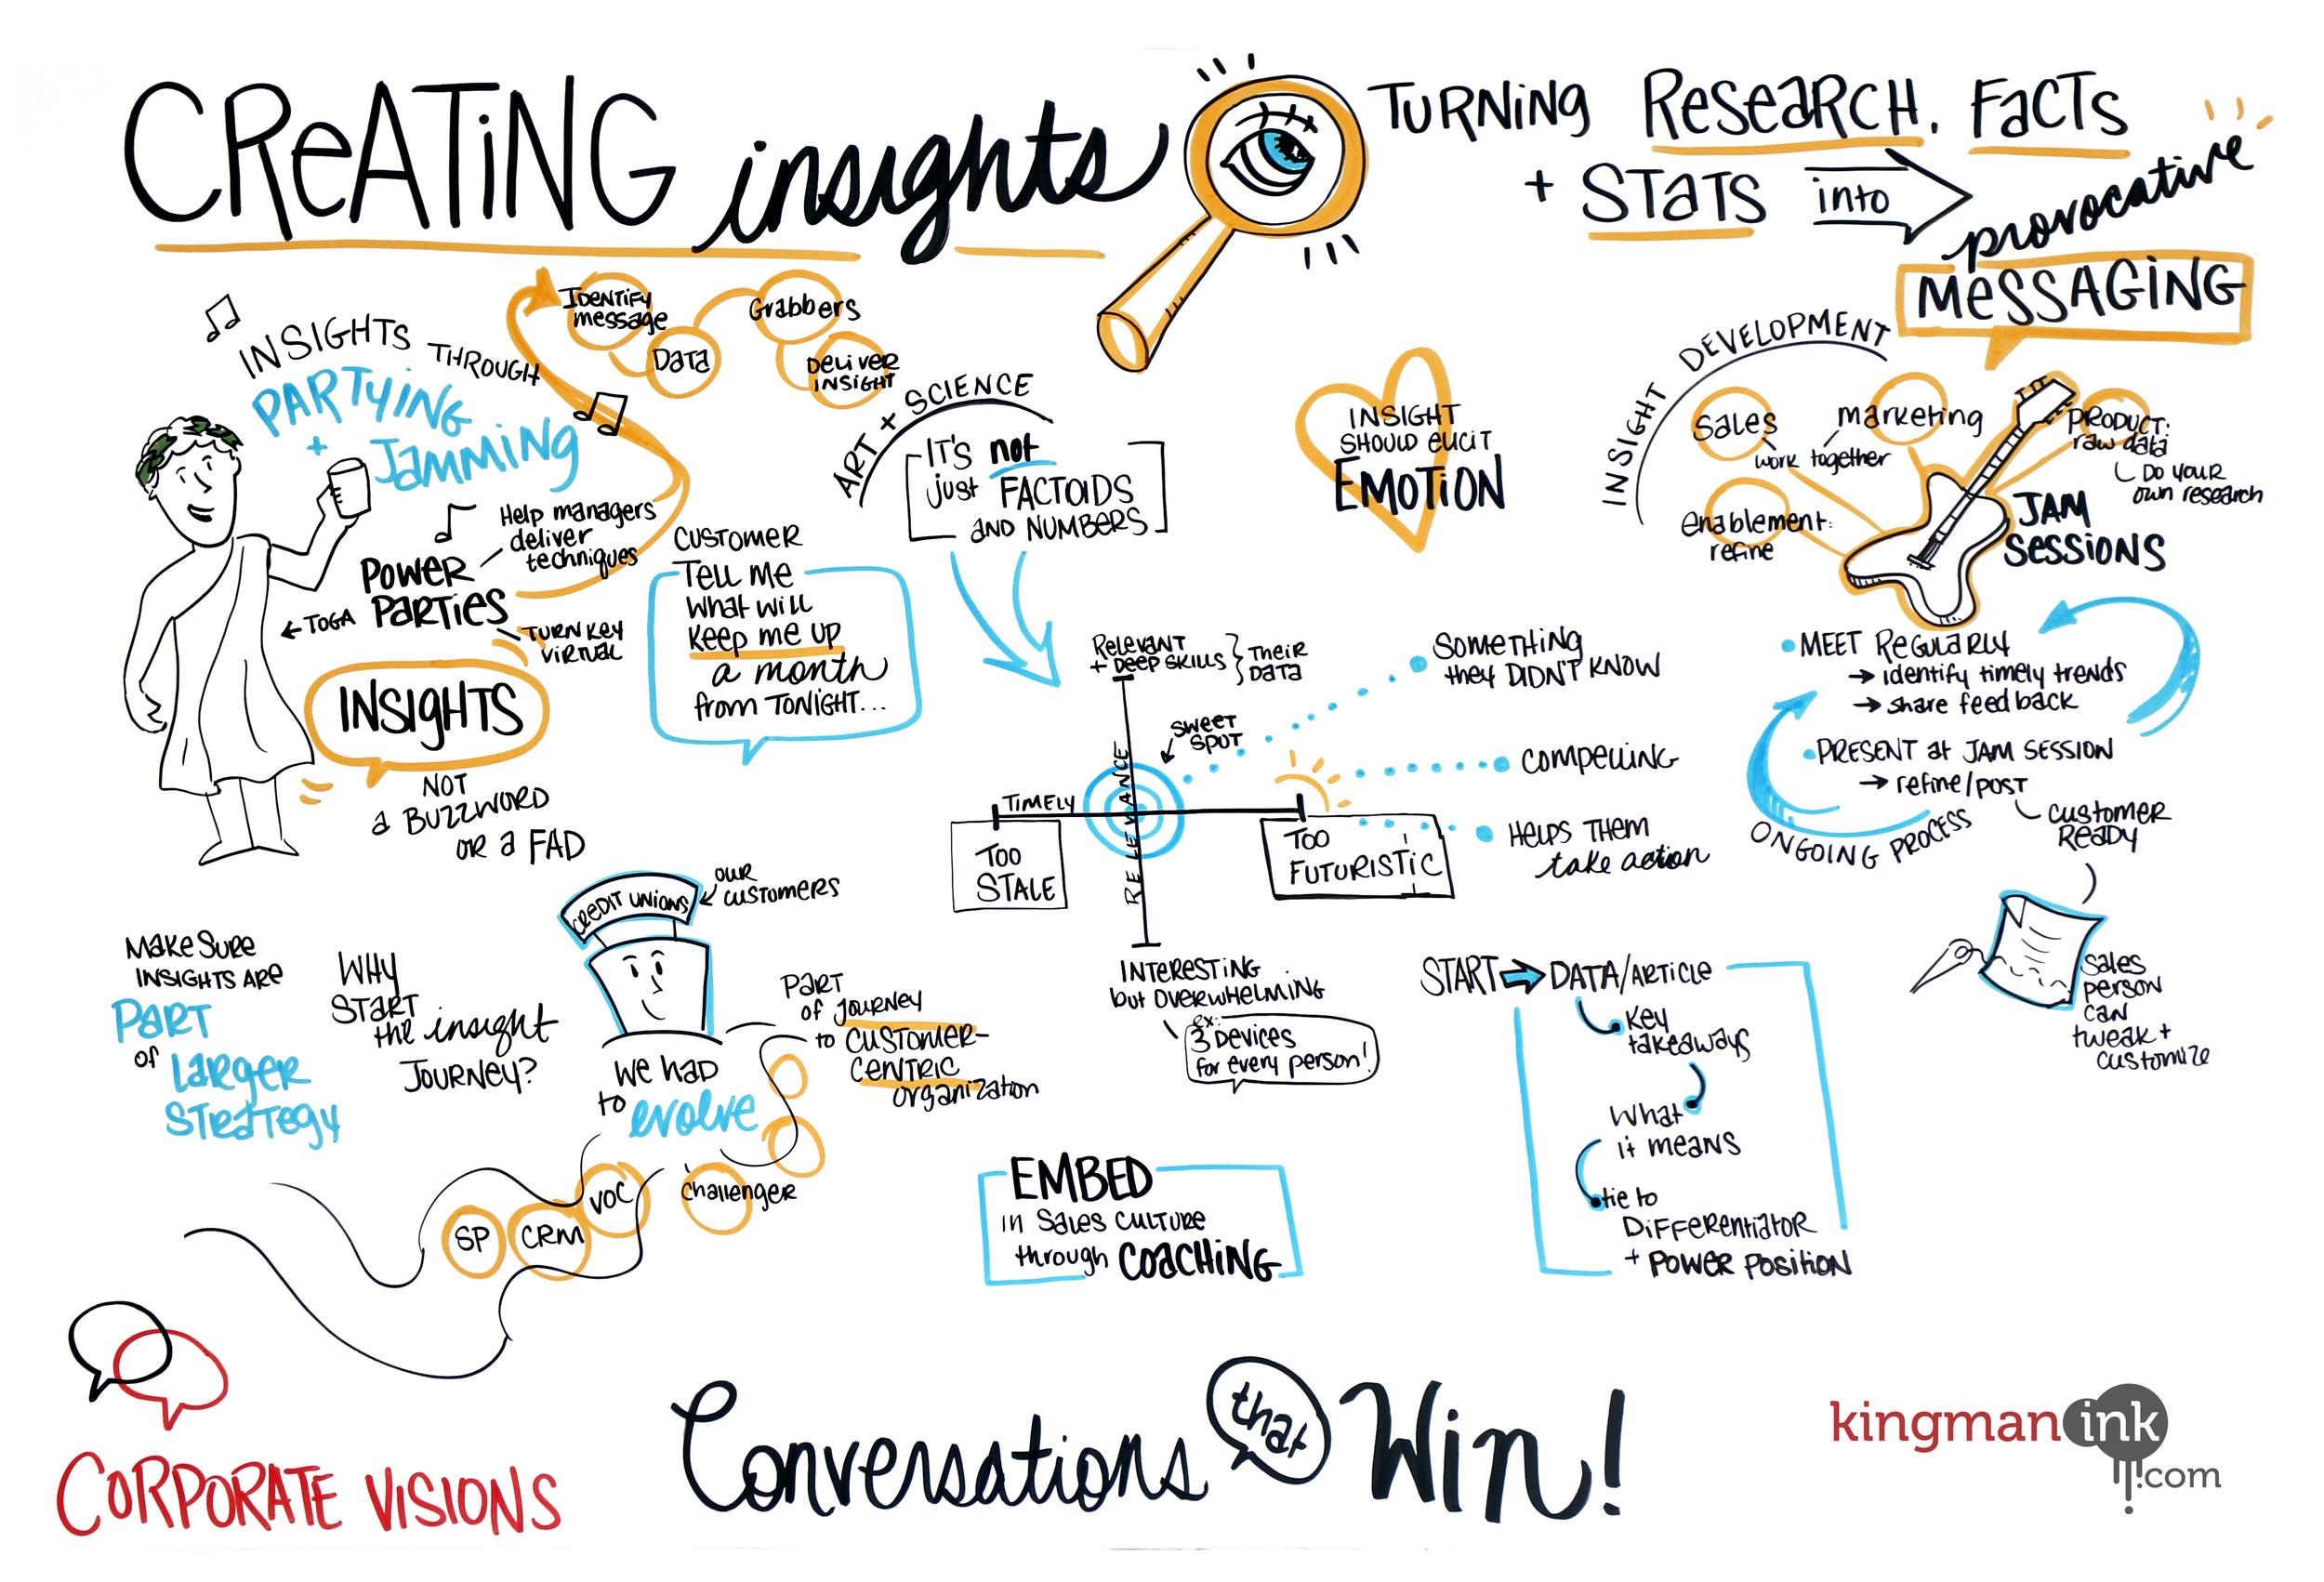 KingmanInk_CorporateVisions_CreatingInsights.jpg